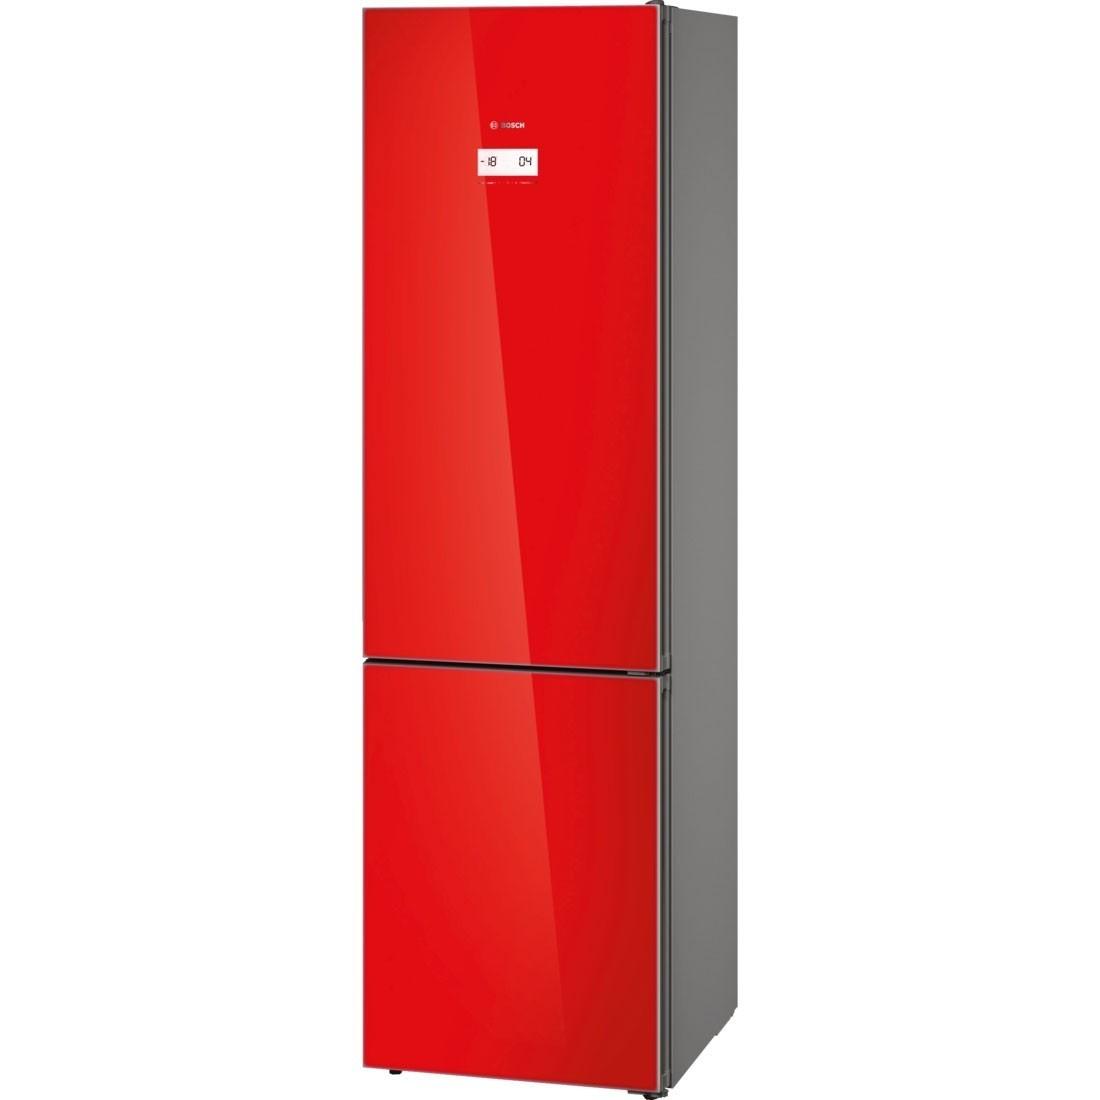 r frig rateur bosch kgn39lr35 de couleur rouge nofrost. Black Bedroom Furniture Sets. Home Design Ideas